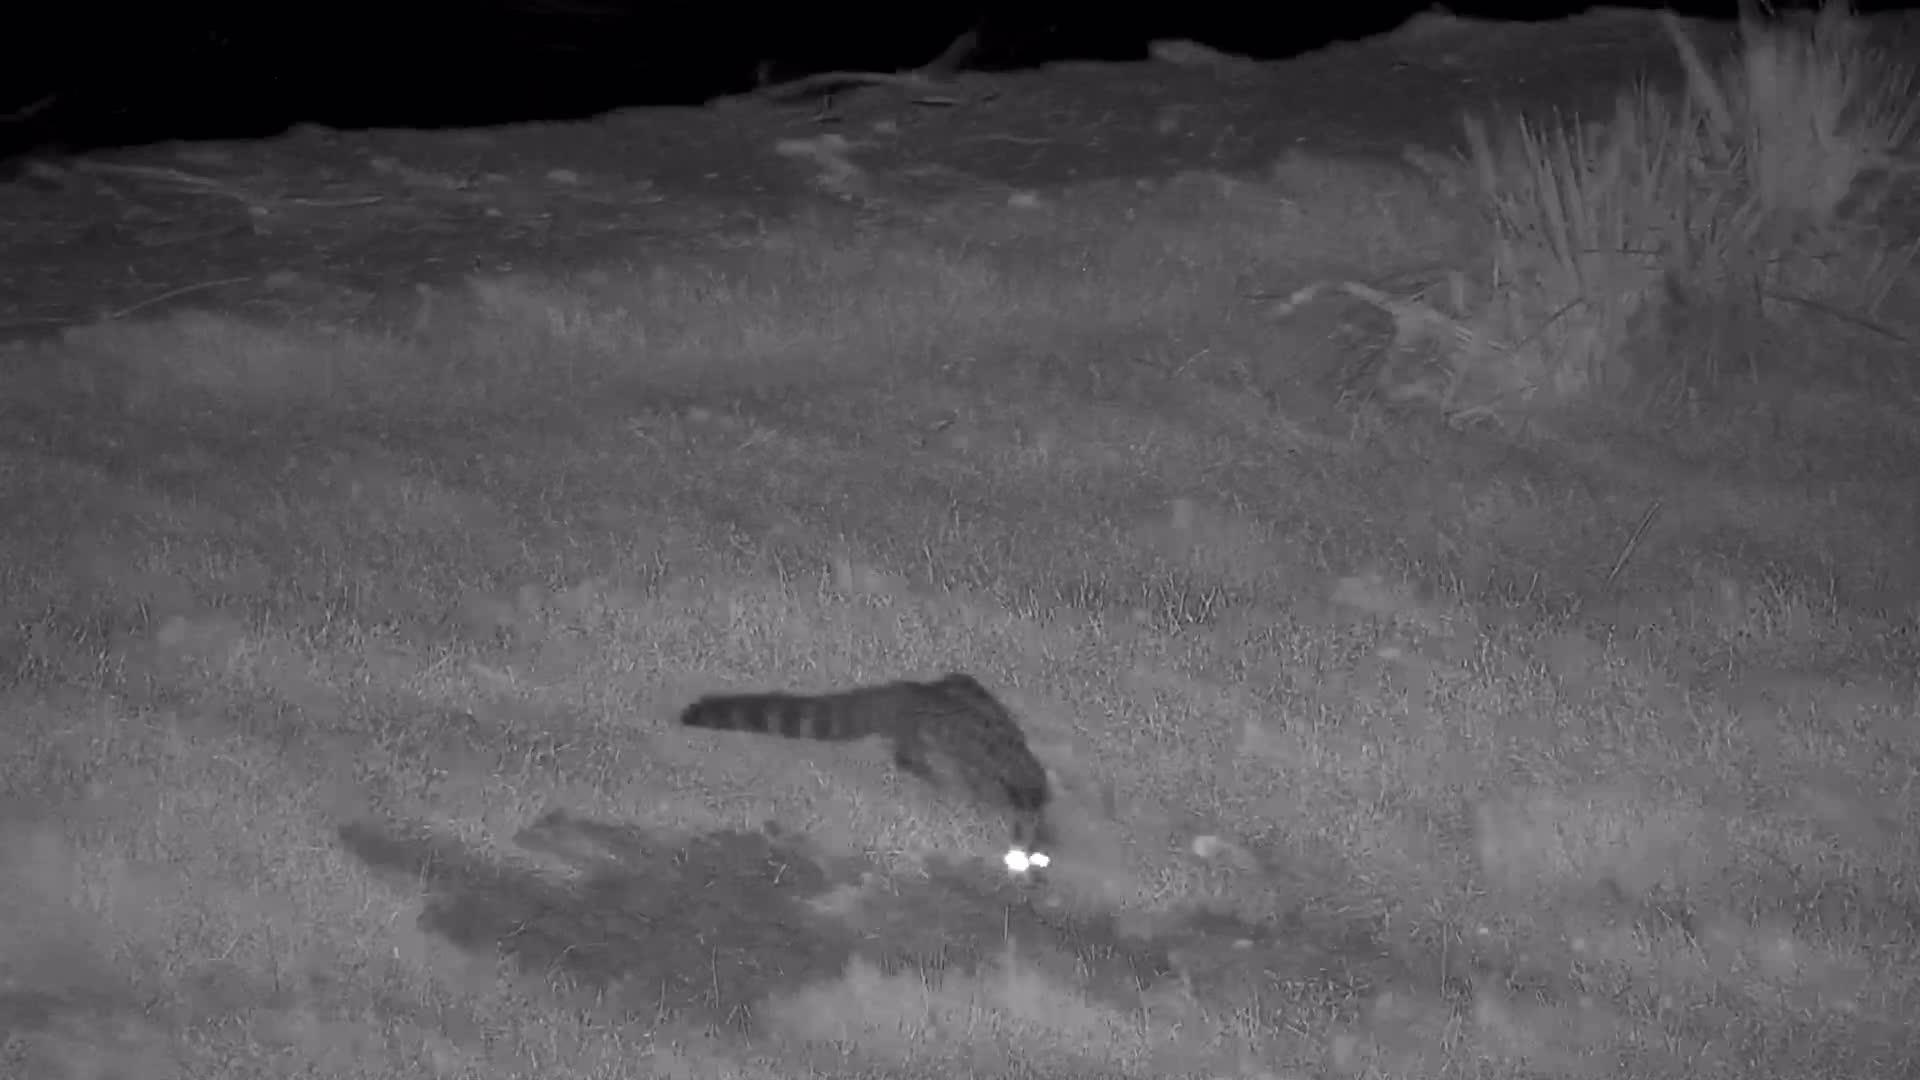 VIDEO:  Genet on its nightly hunt.